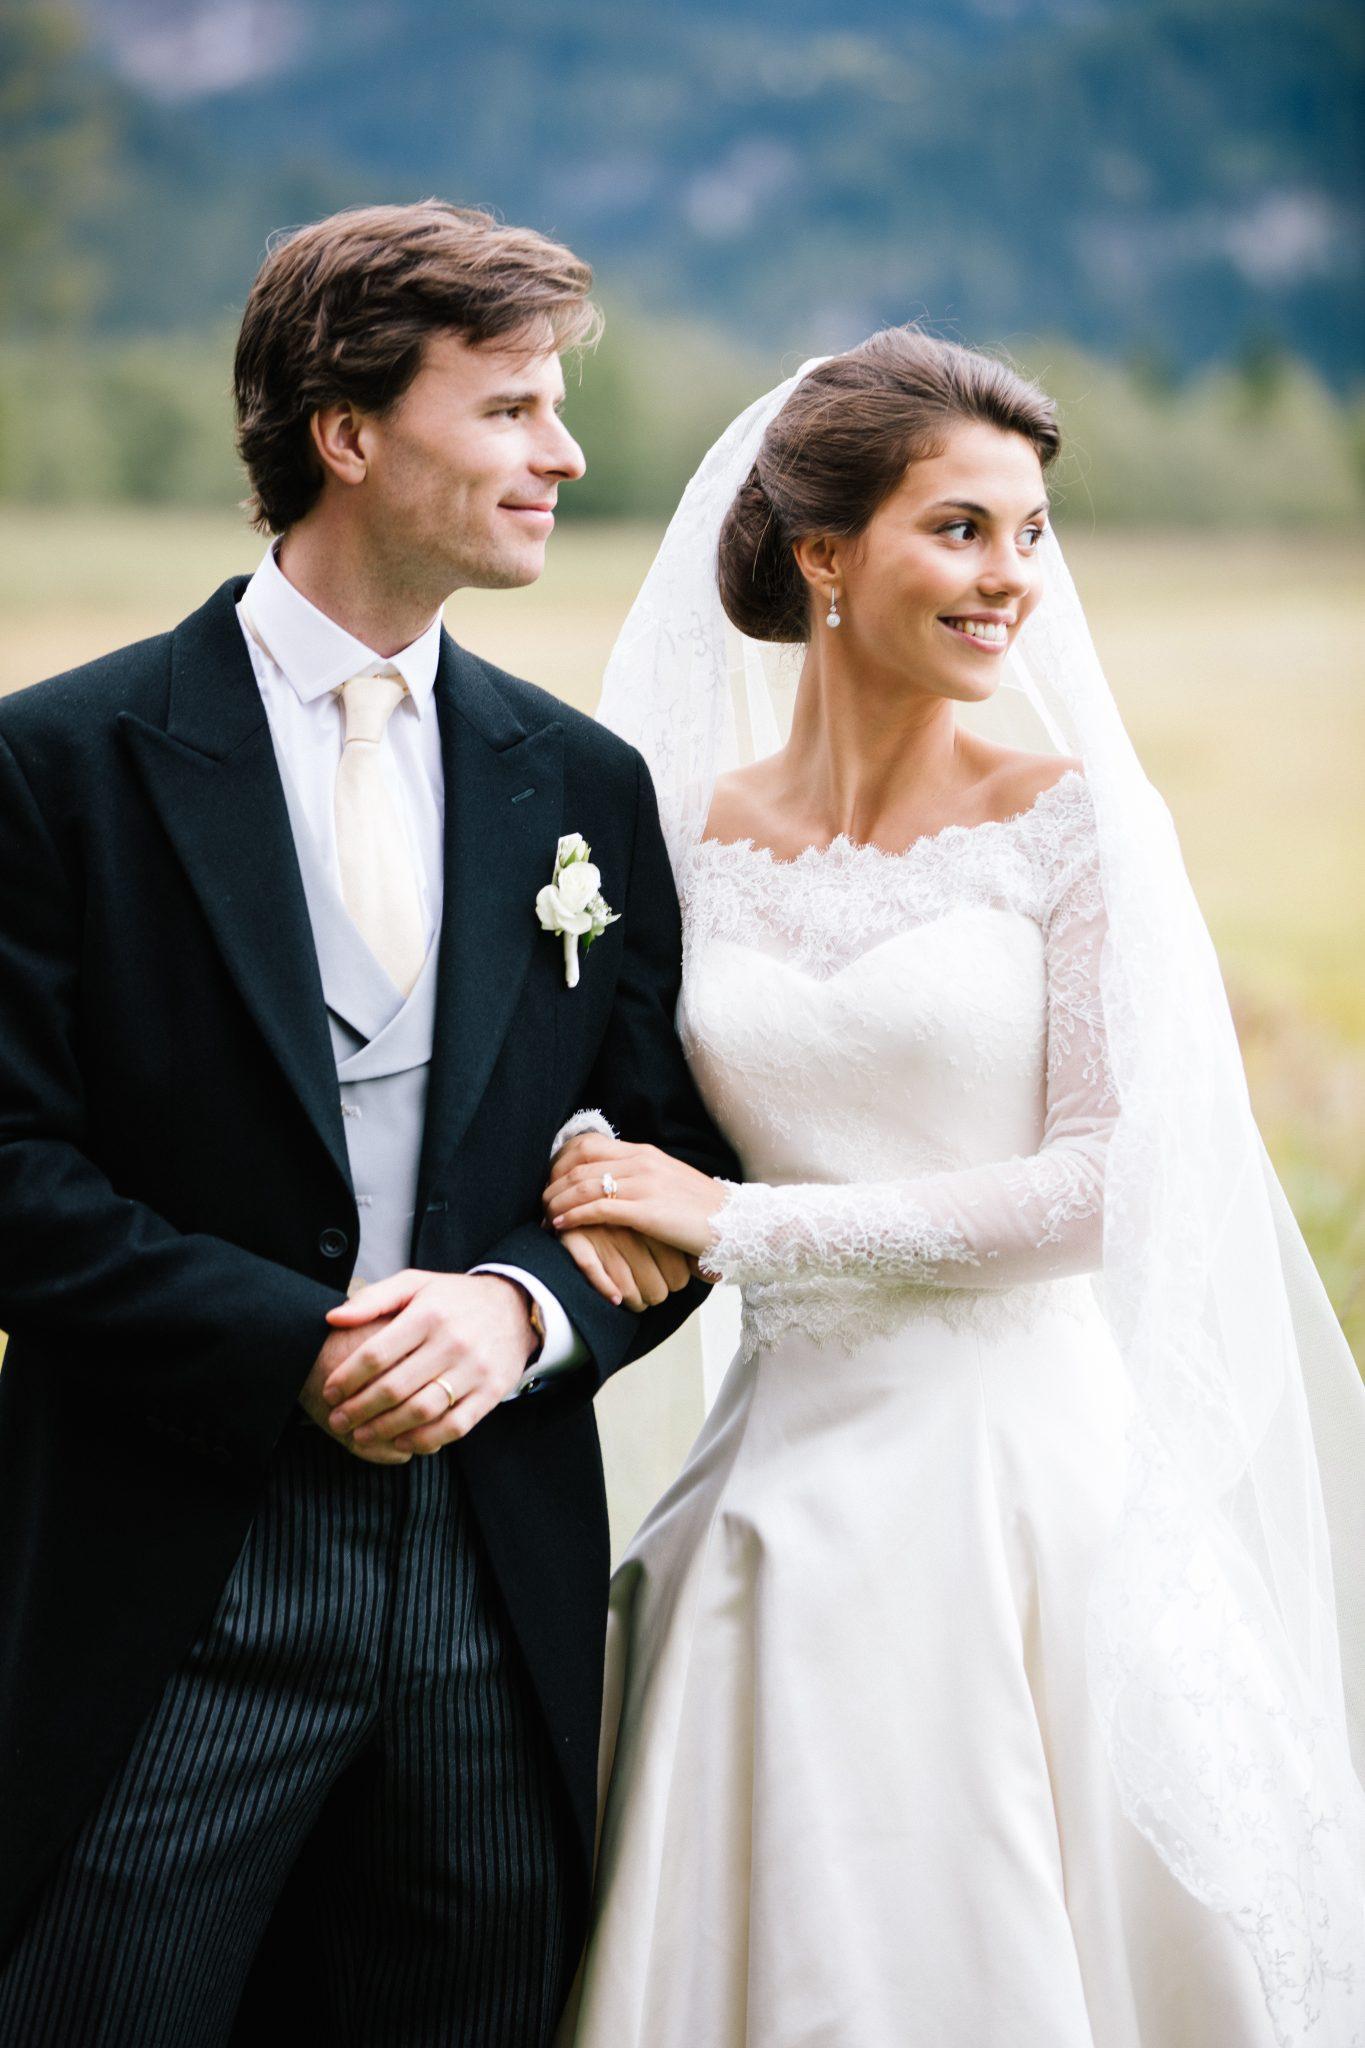 The Long Sleeved Wedding Dress